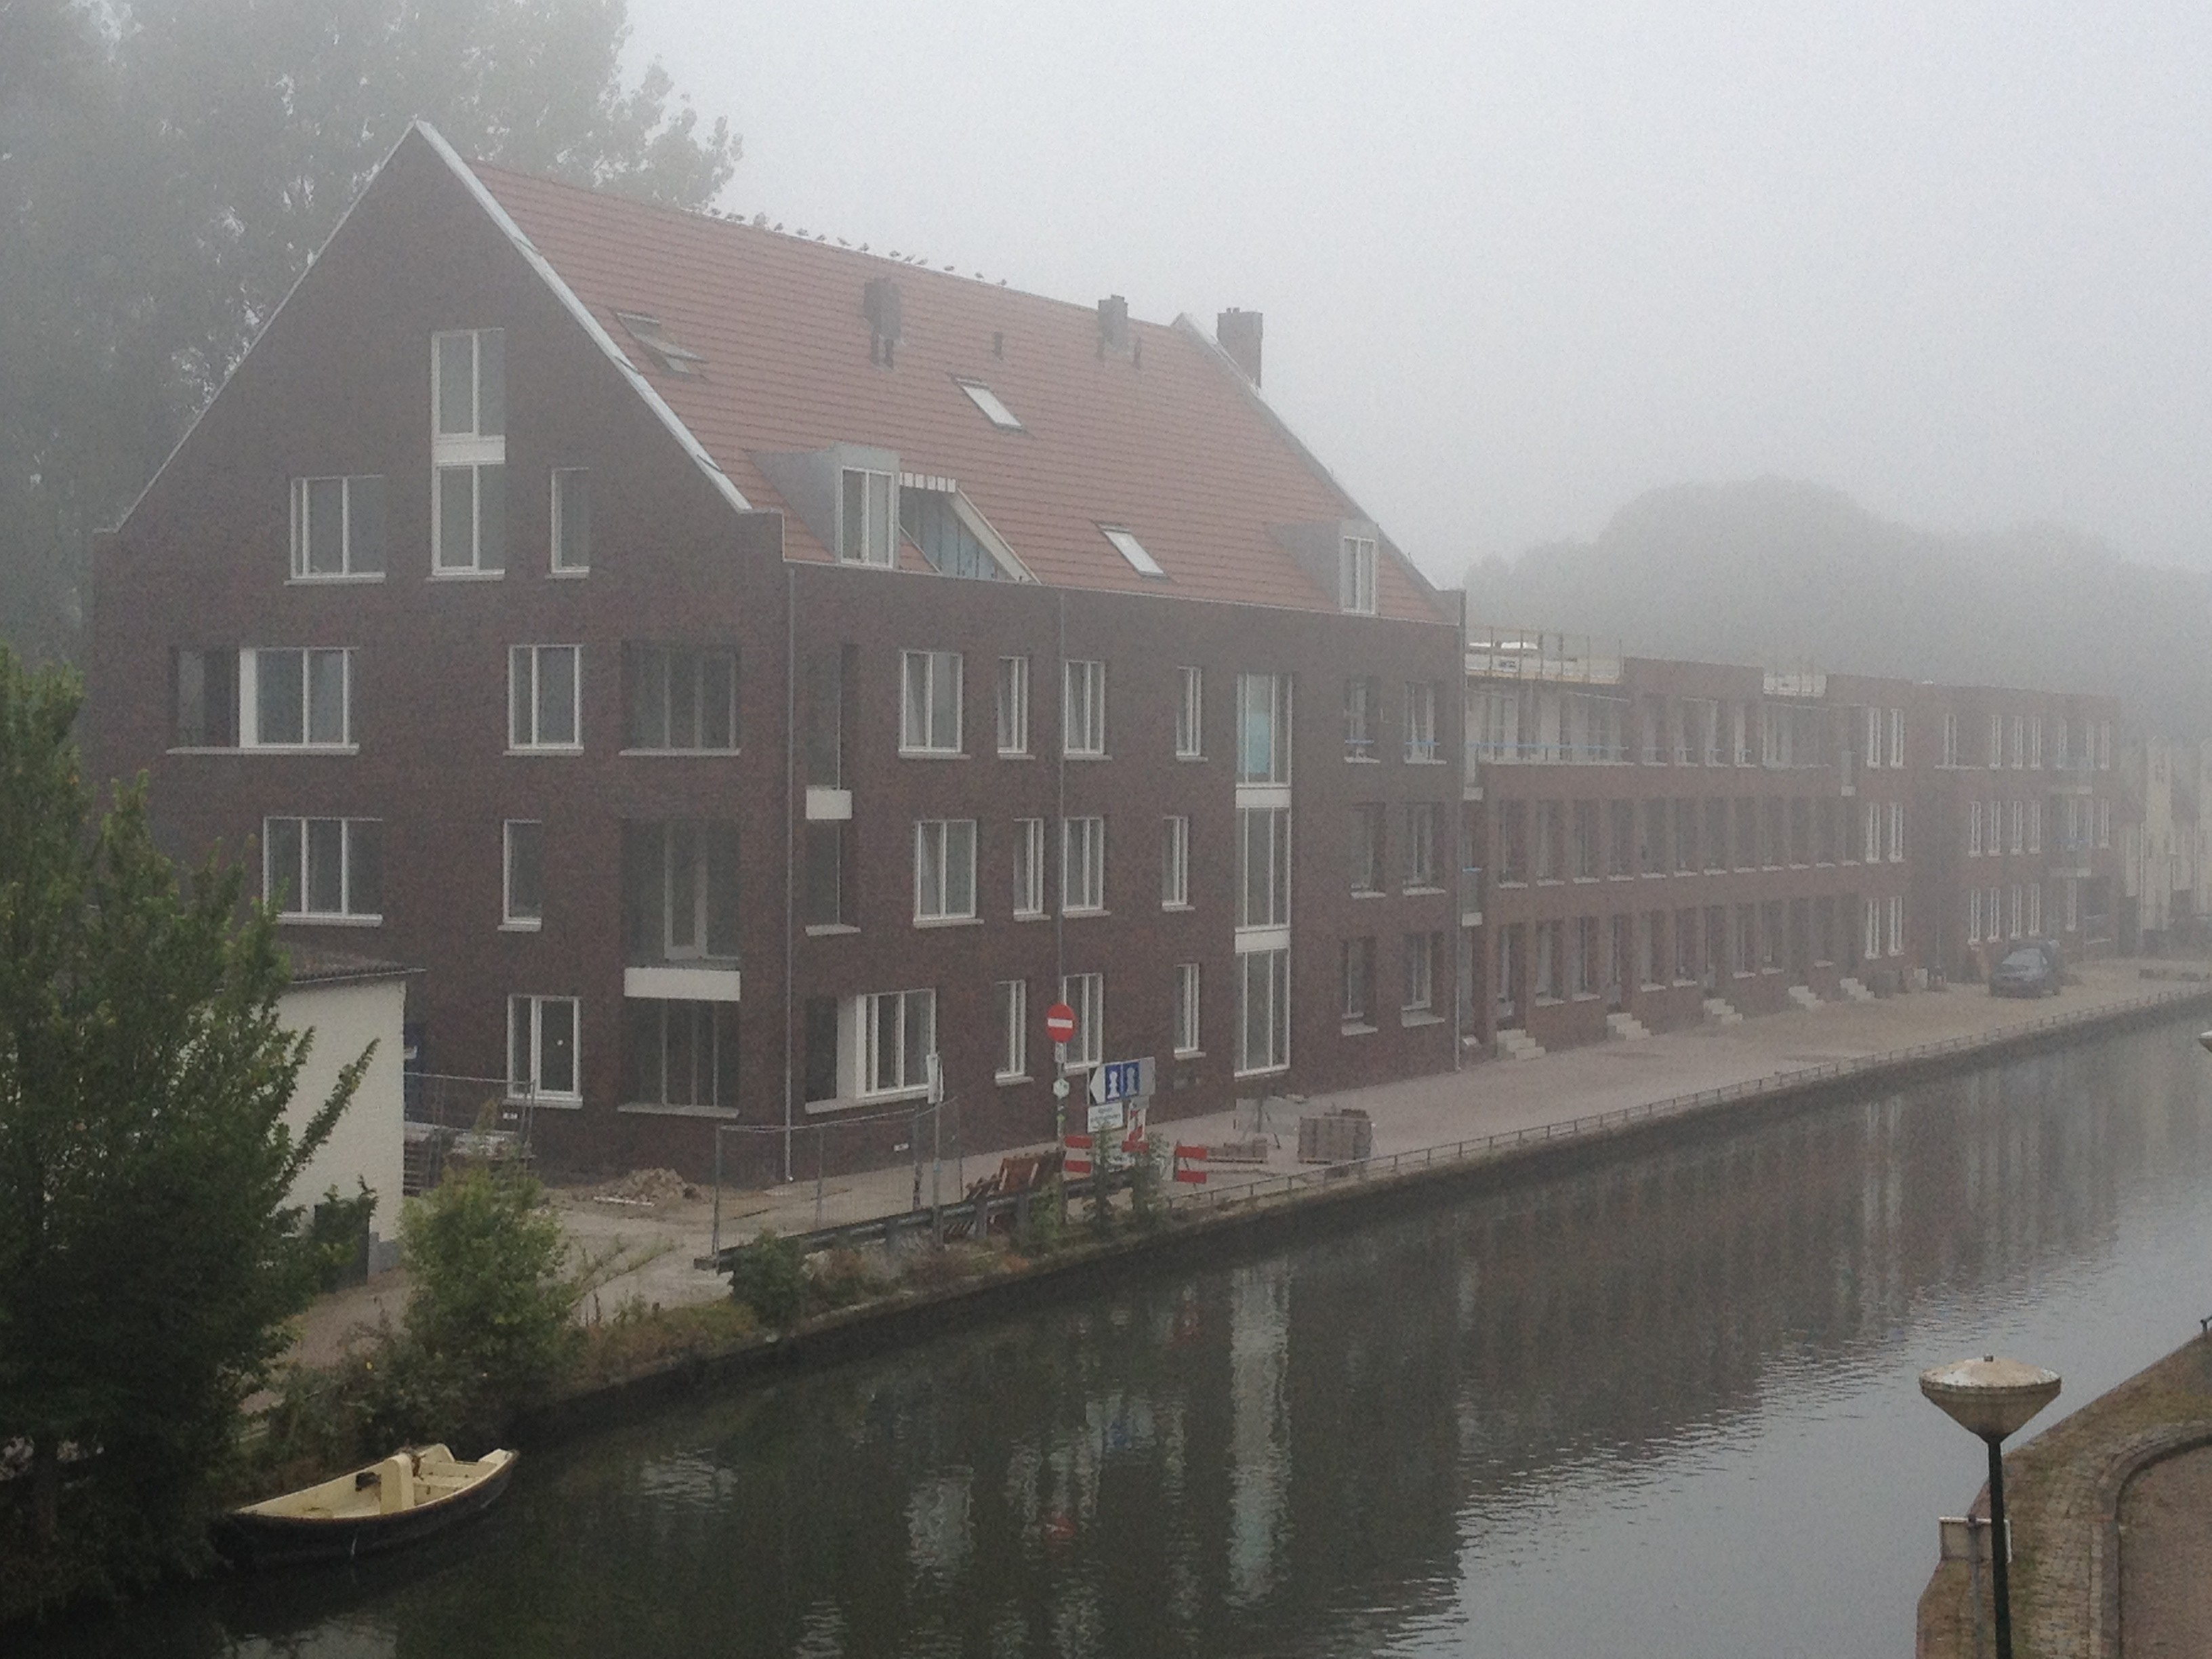 BKT_provides_devriesenverburg_IJsselstein_appartementen_Panoven_parkeerkelder_schuindak_metslwerk_zink_bouwbord_Cubord_Esbi_02.jpg